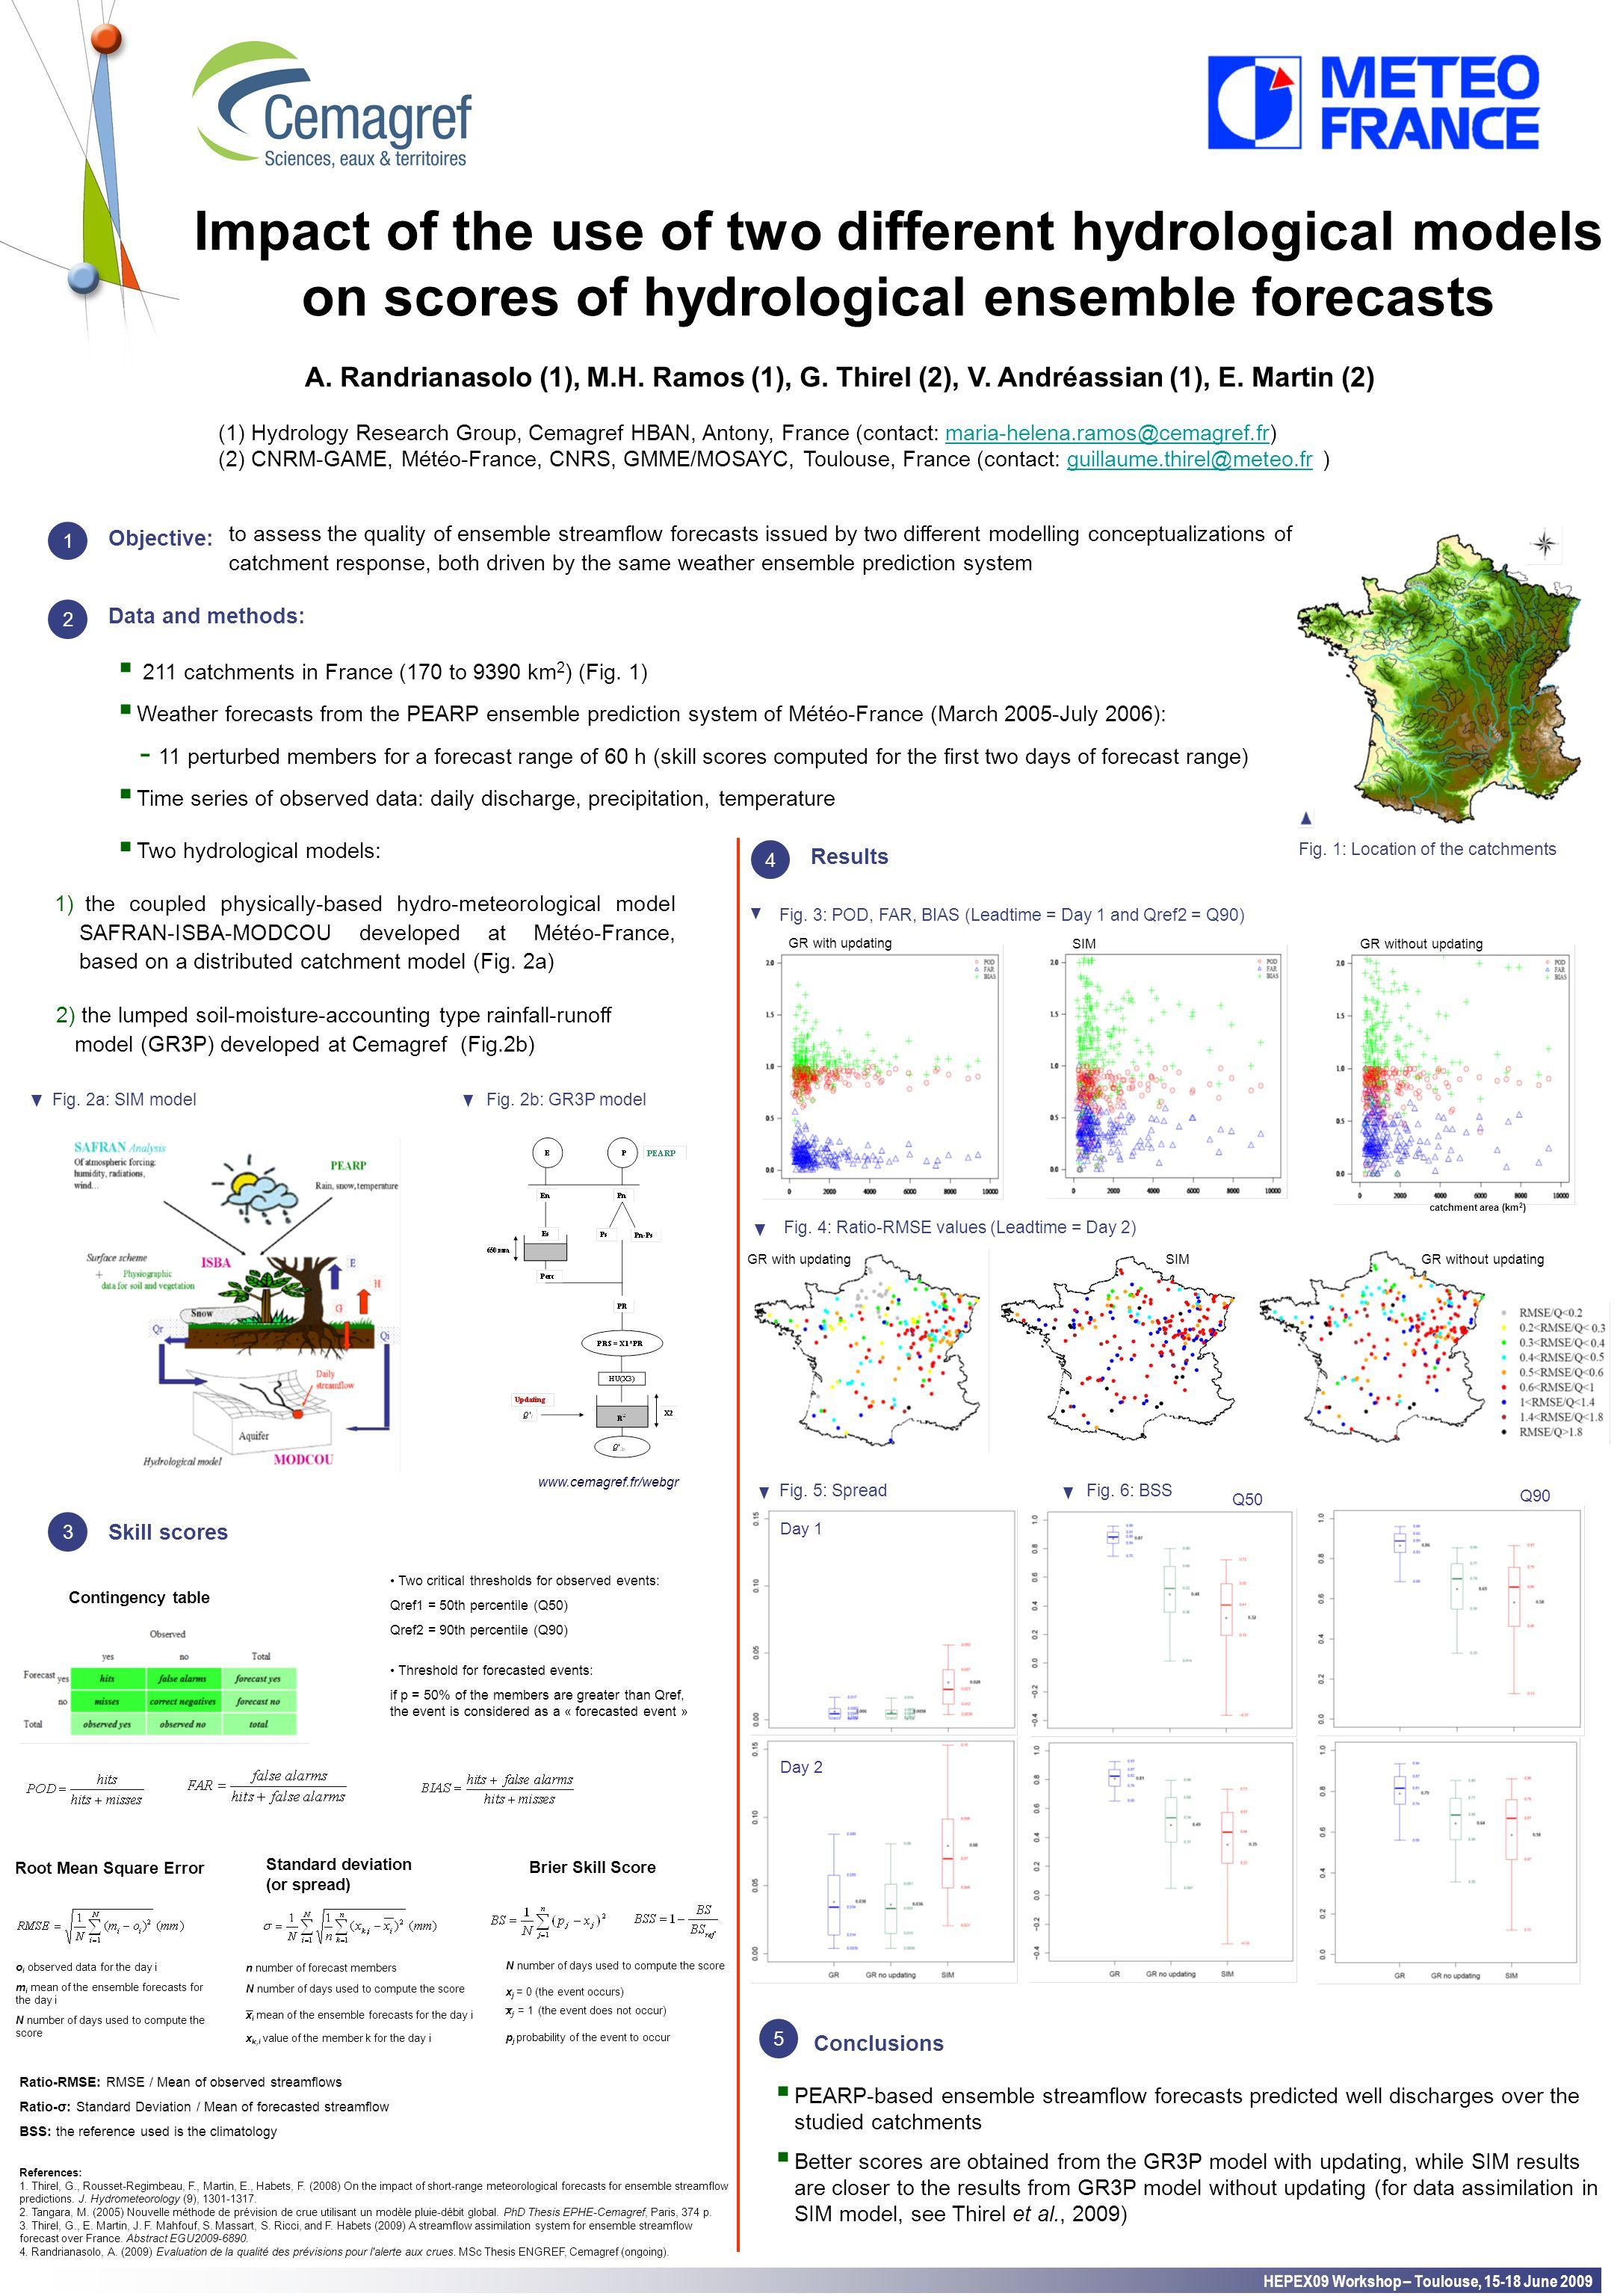 A. Randrianasolo (1), M.H. Ramos (1), G. Thirel (2), V. Andréassian (1), E. Martin (2) (1) Hydrology Research Group, Cemagref HBAN, Antony, France (co